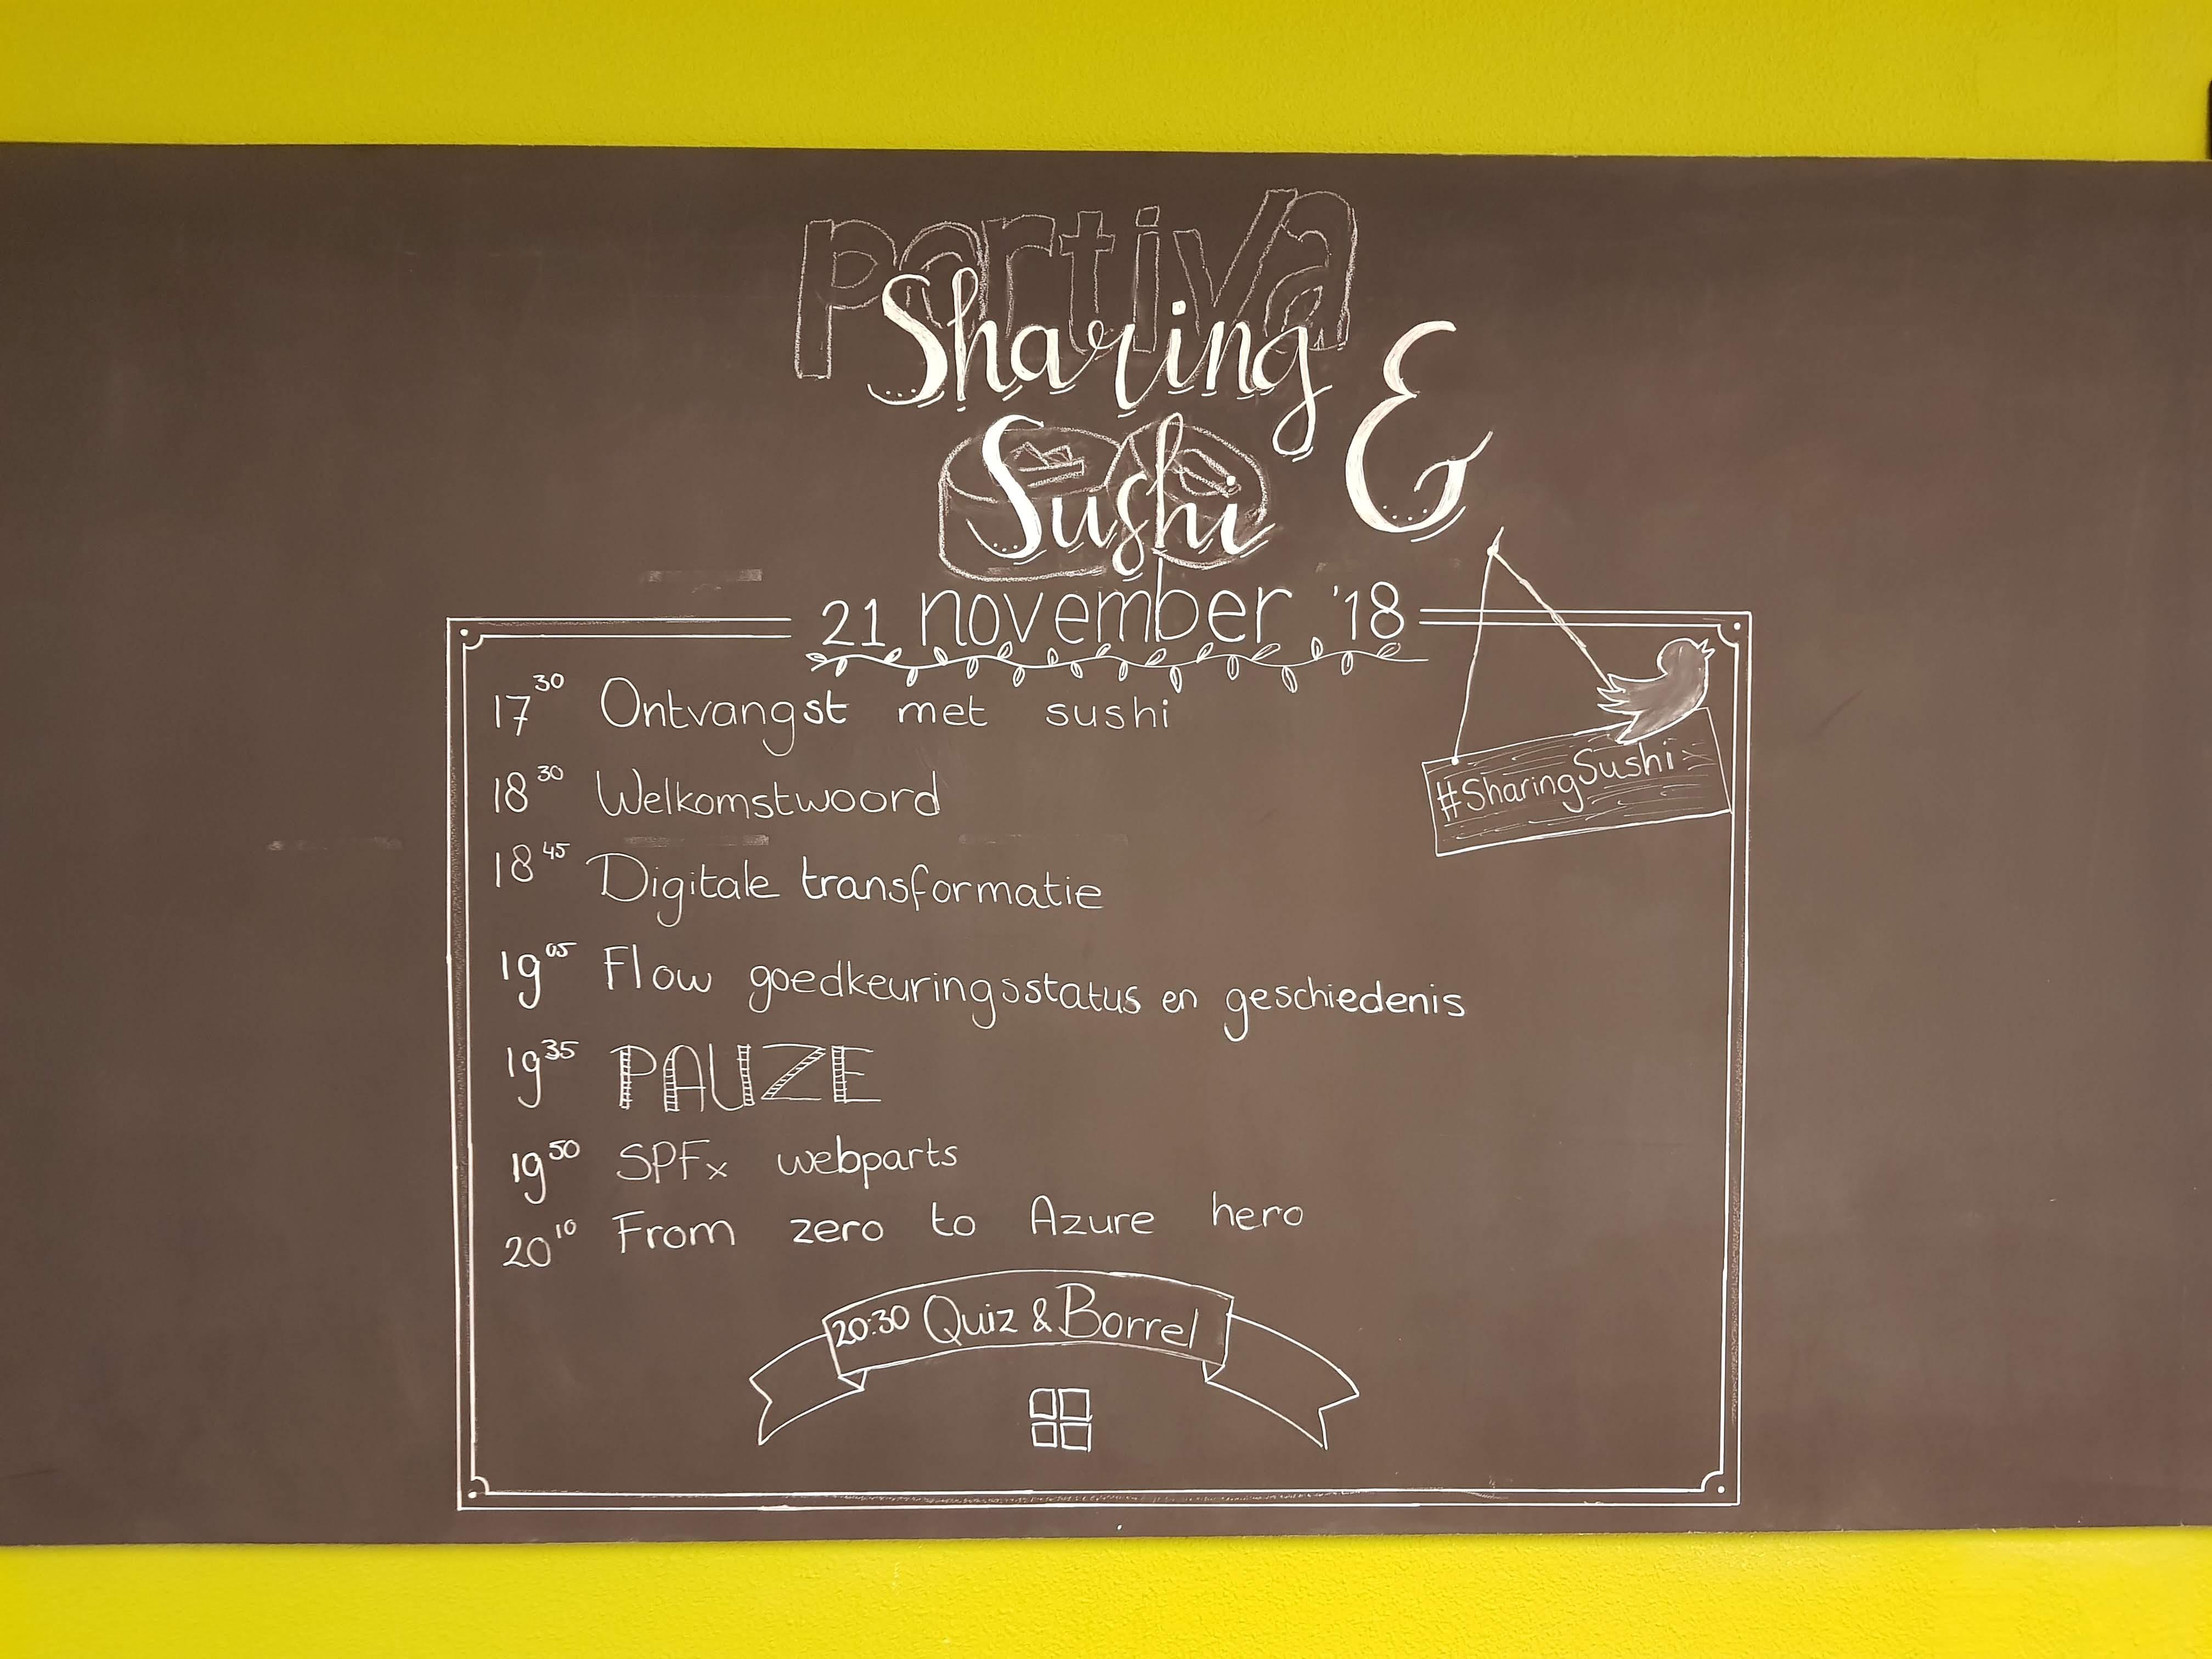 Krijtbord met Sharing en Sushi programma